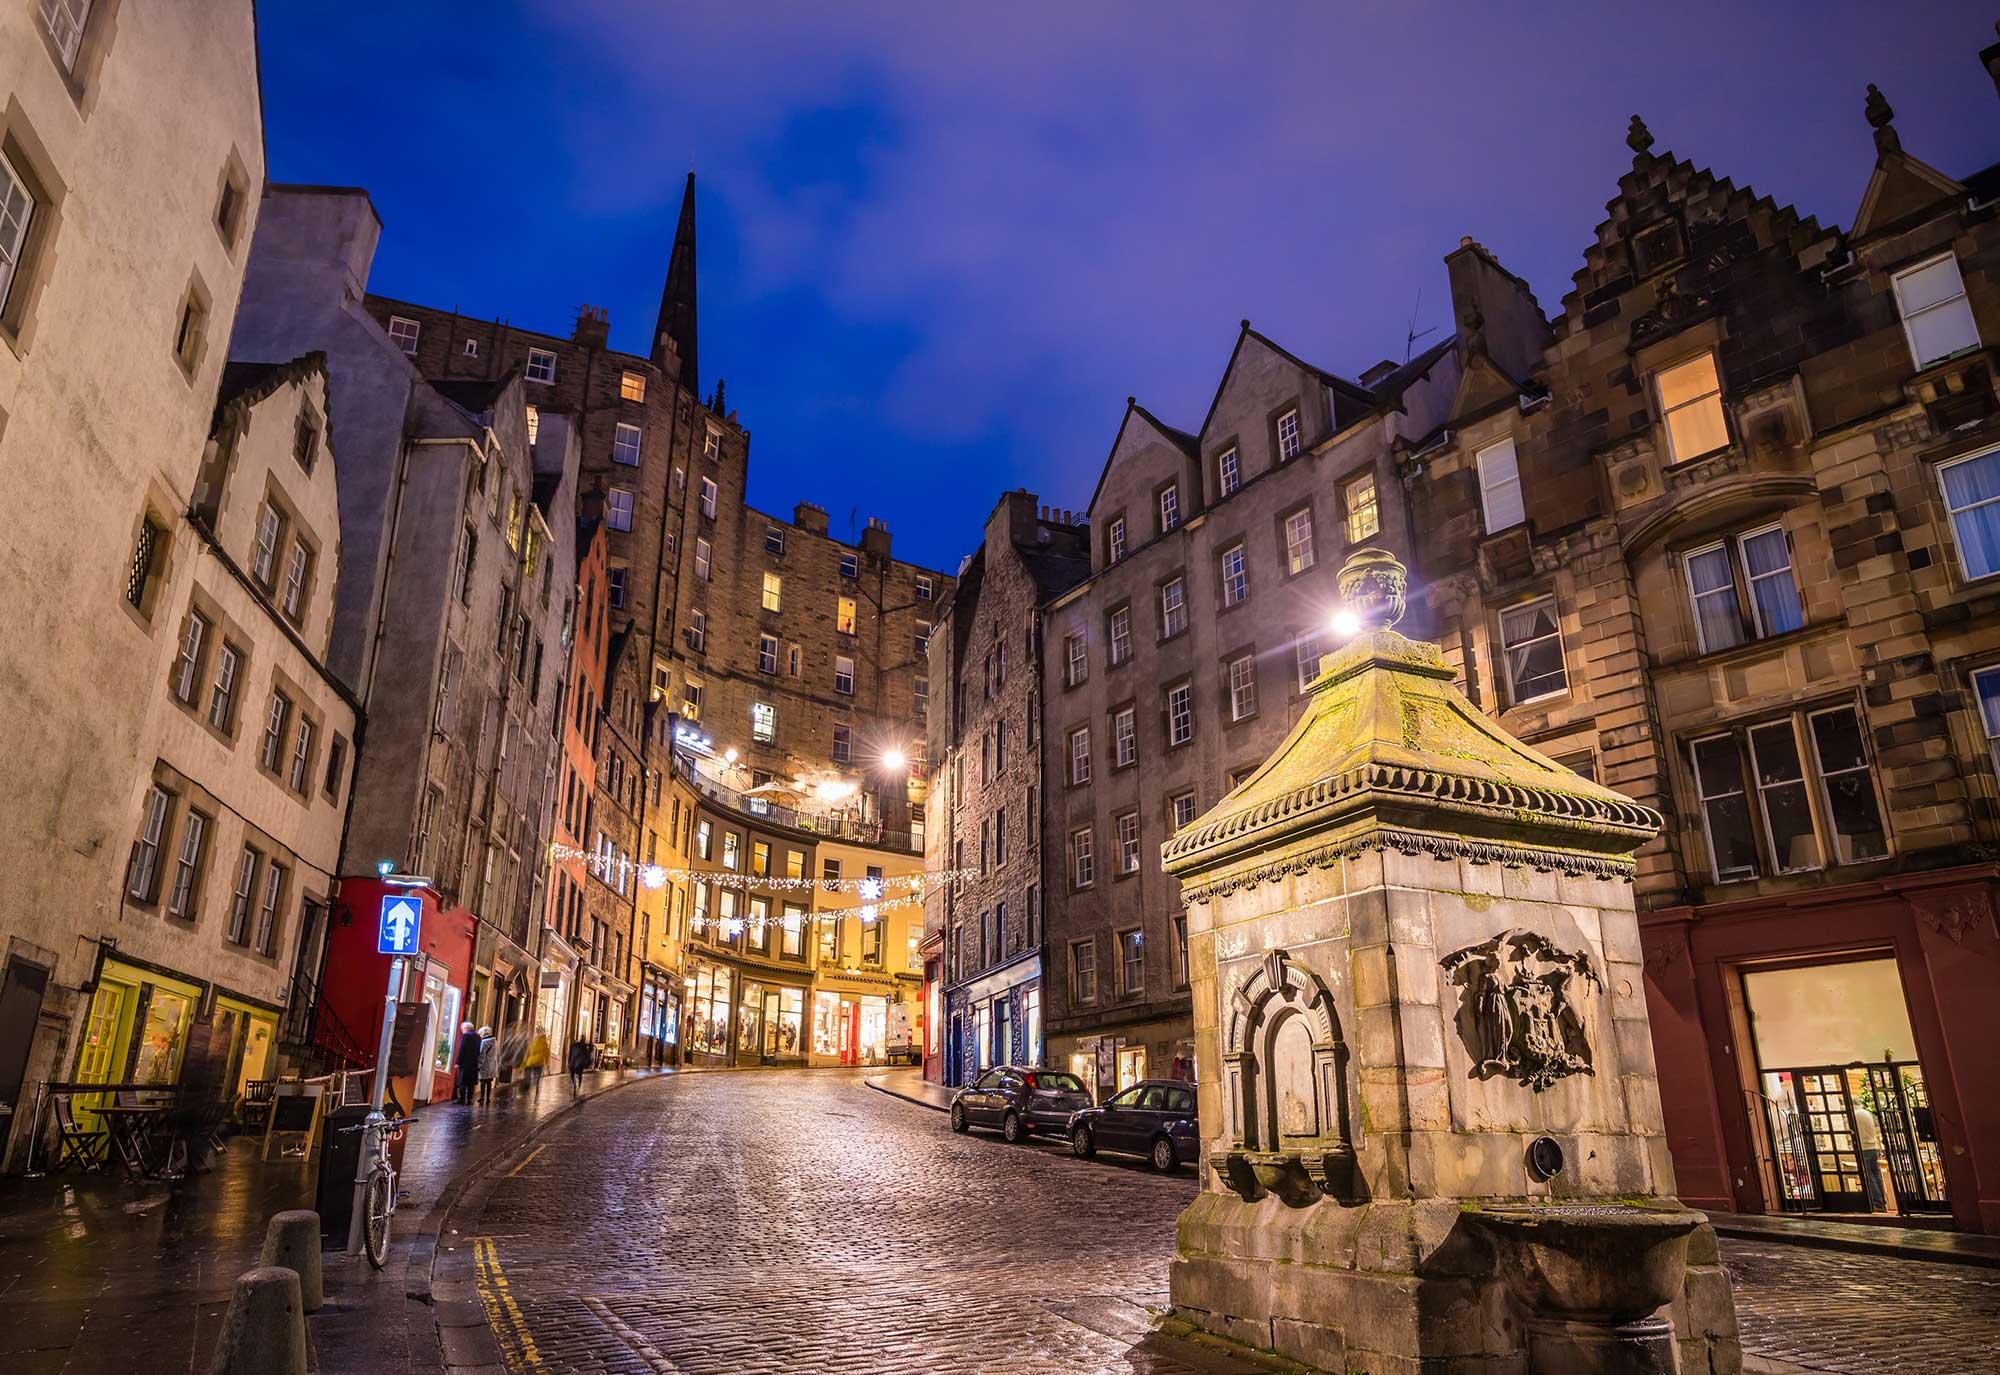 Night time street view of the historic old town, Edinburgh, Scotland